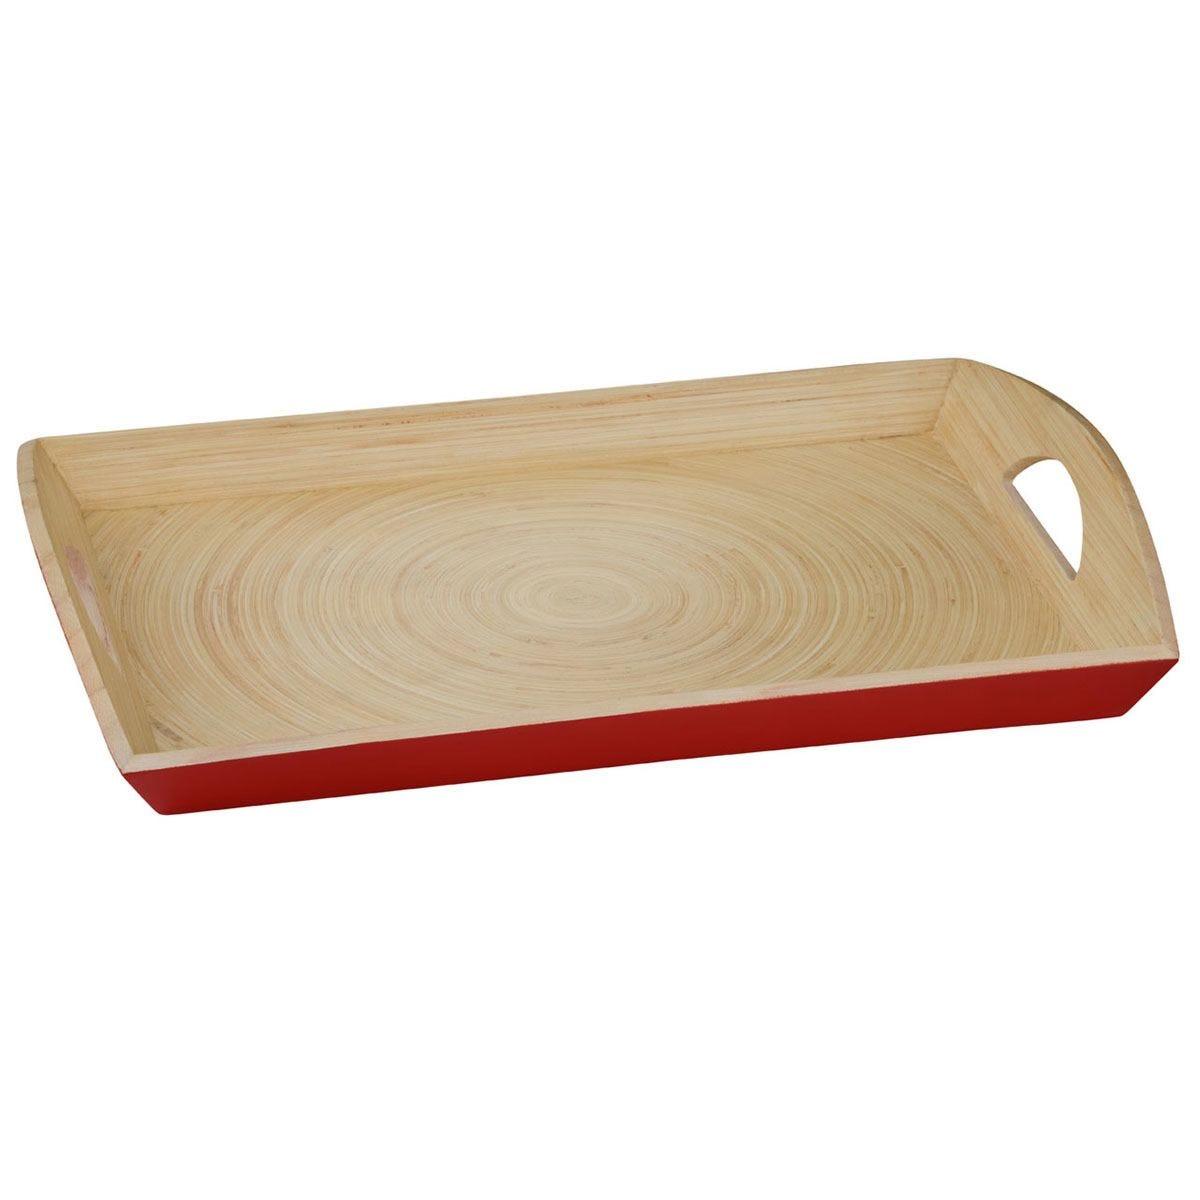 Premier Housewares Kyoto Tray - Red